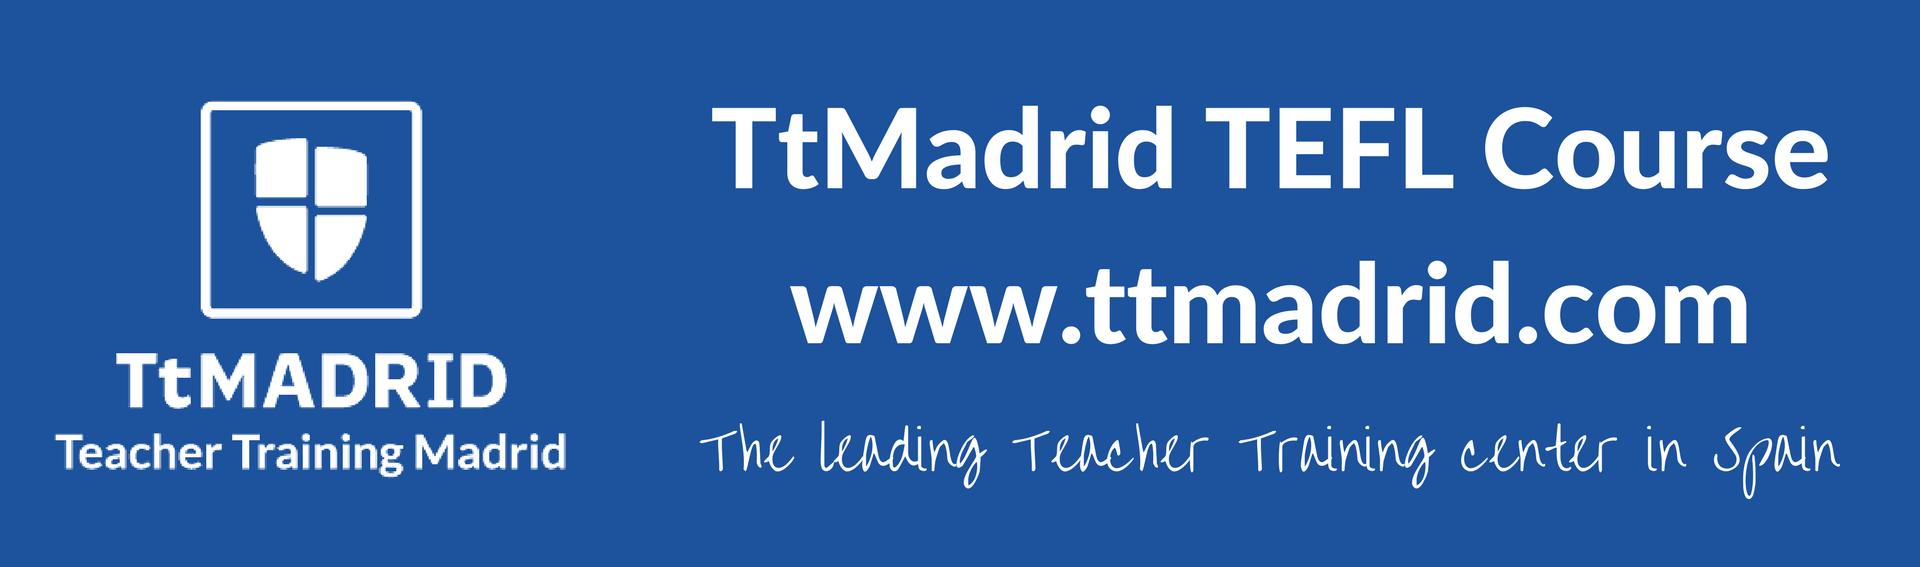 TtMadrid TEFL Course leading teacher training center in Spain